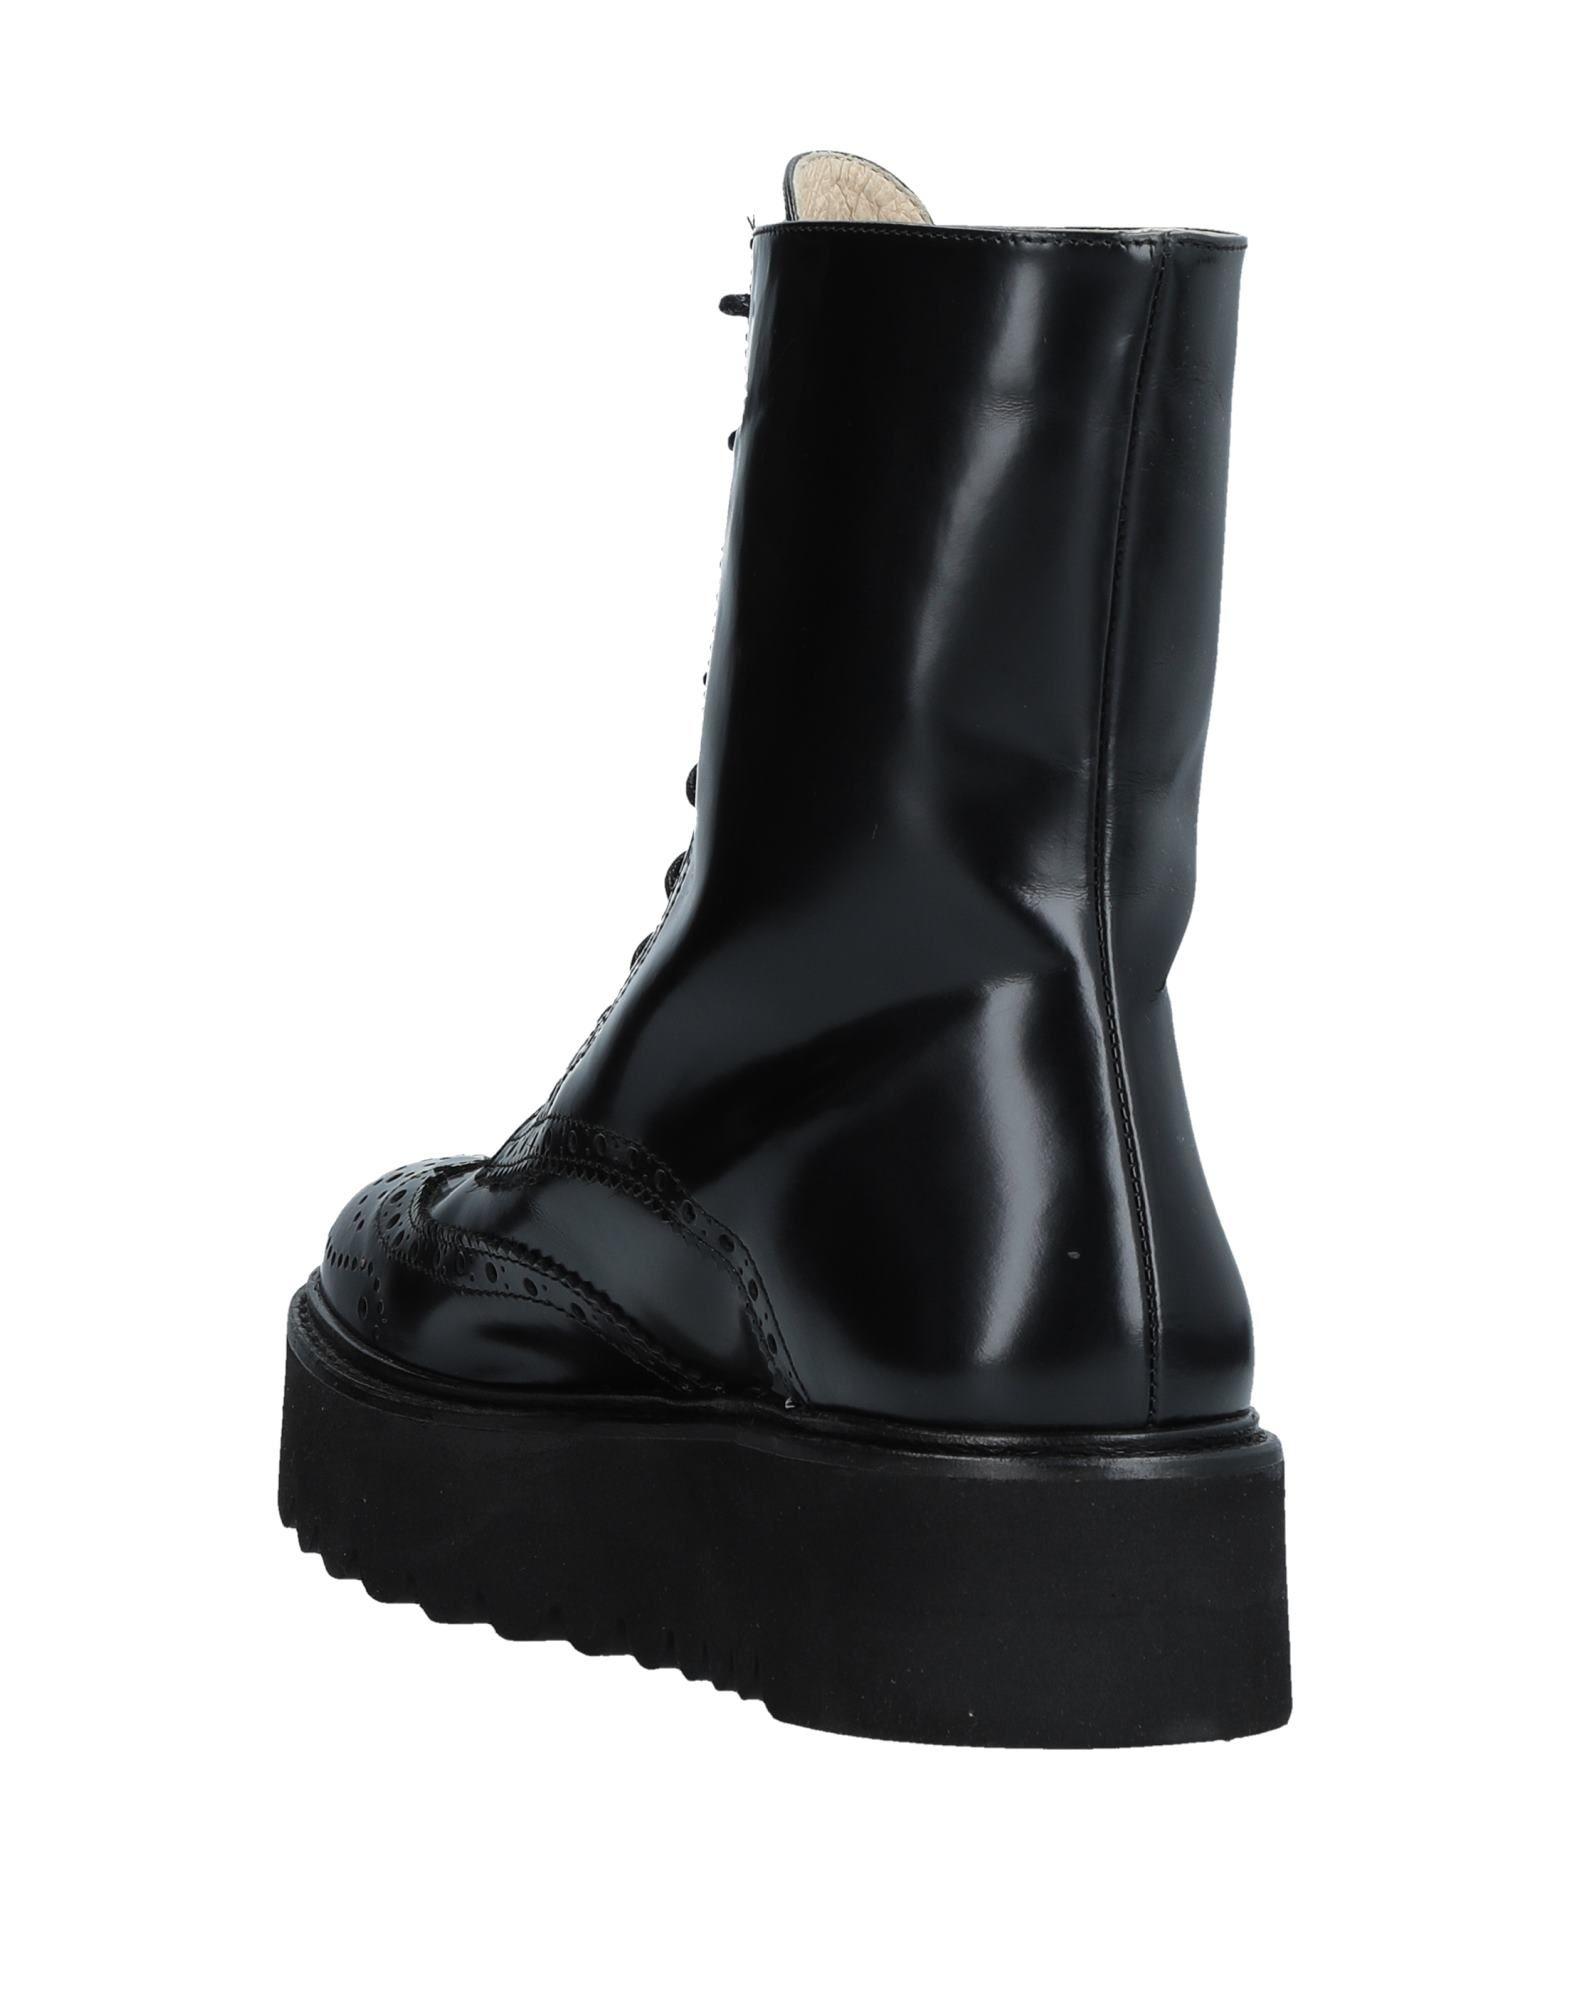 Palomitas By  Paloma Barceló Stiefelette Damen  By 11539137SI Gute Qualität beliebte Schuhe 314b24